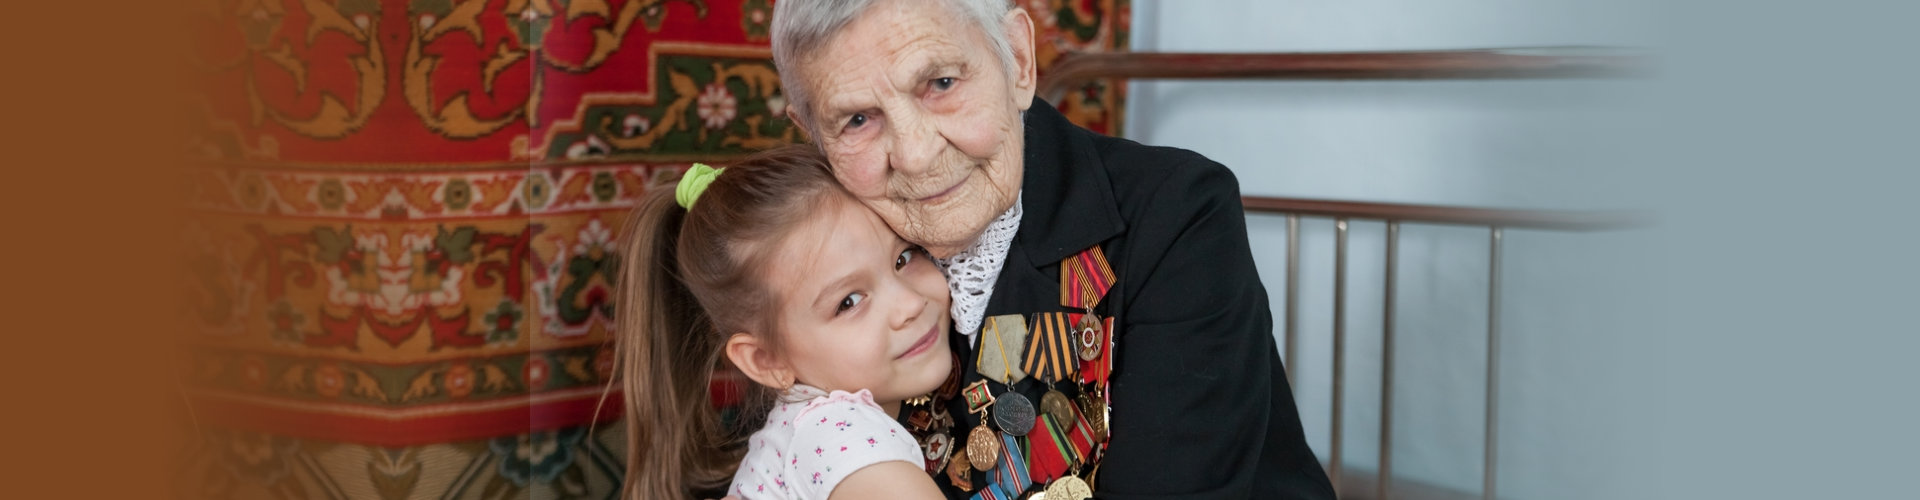 vetaran hugging a little girl